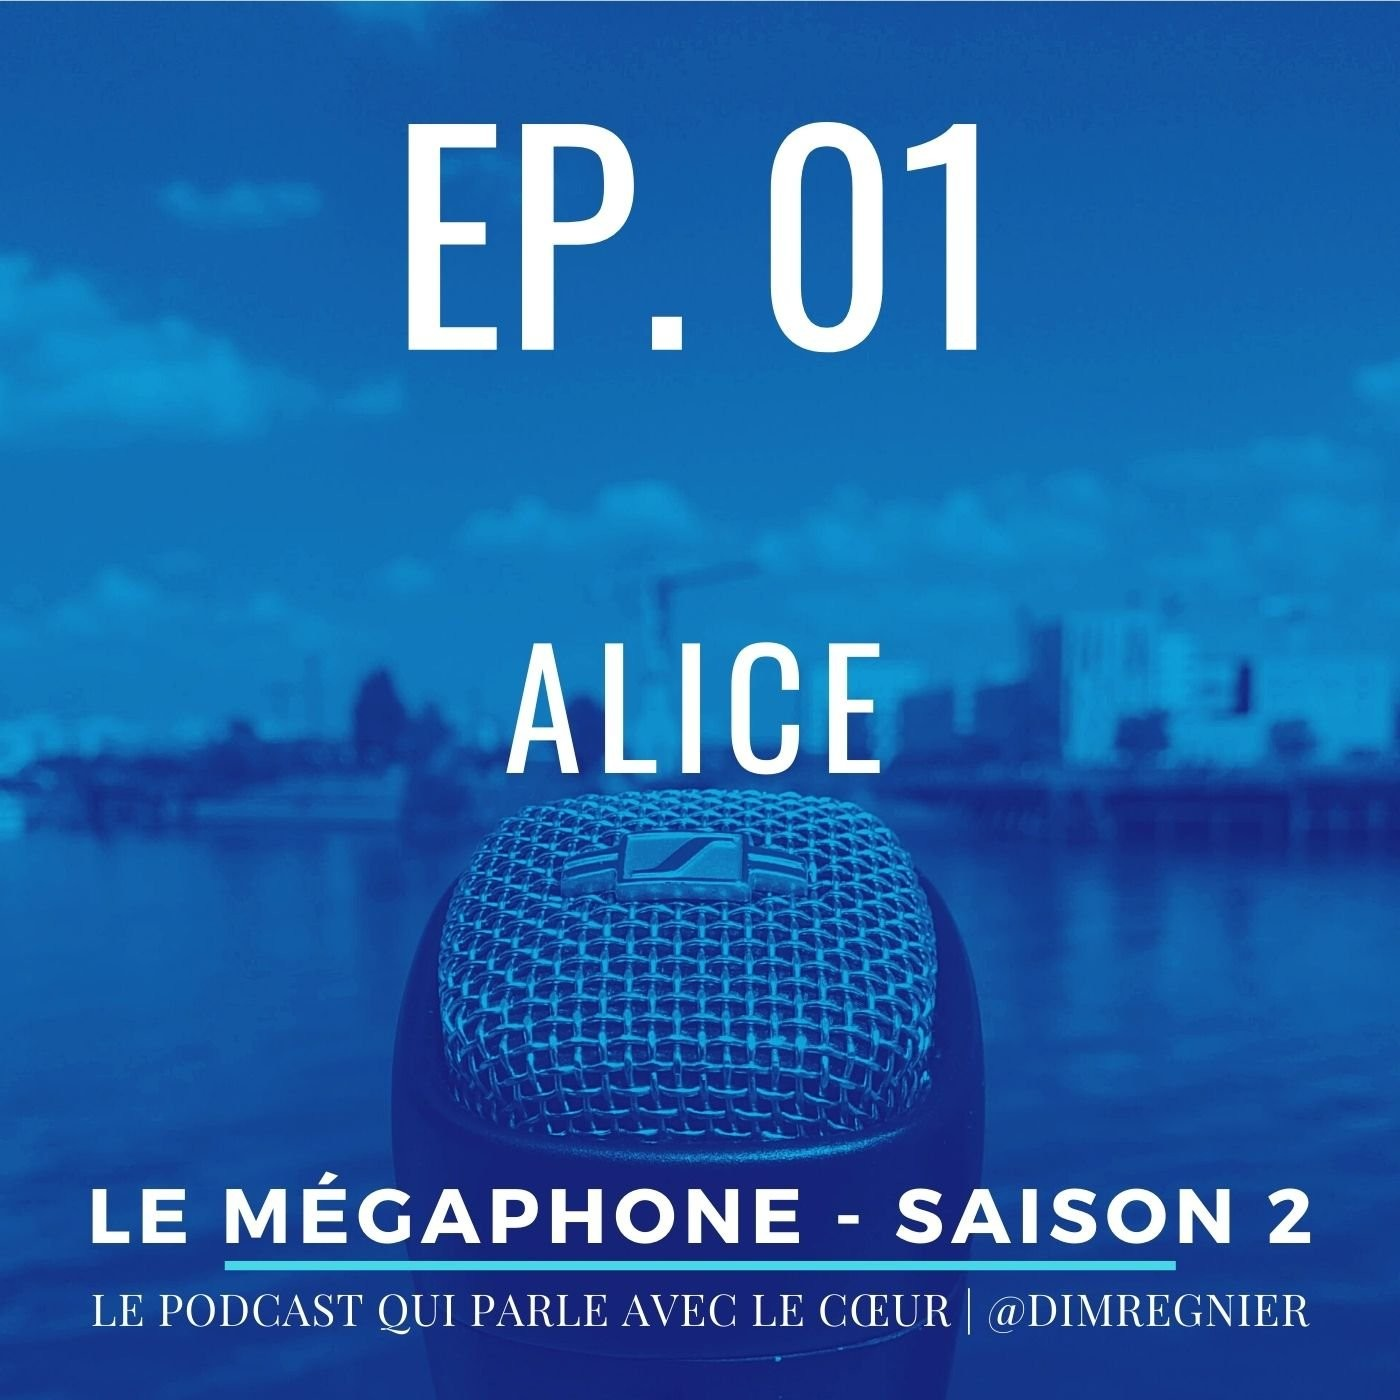 Ép. 01 - Alice, Astor Piazzolla & Philippe Jaroussky